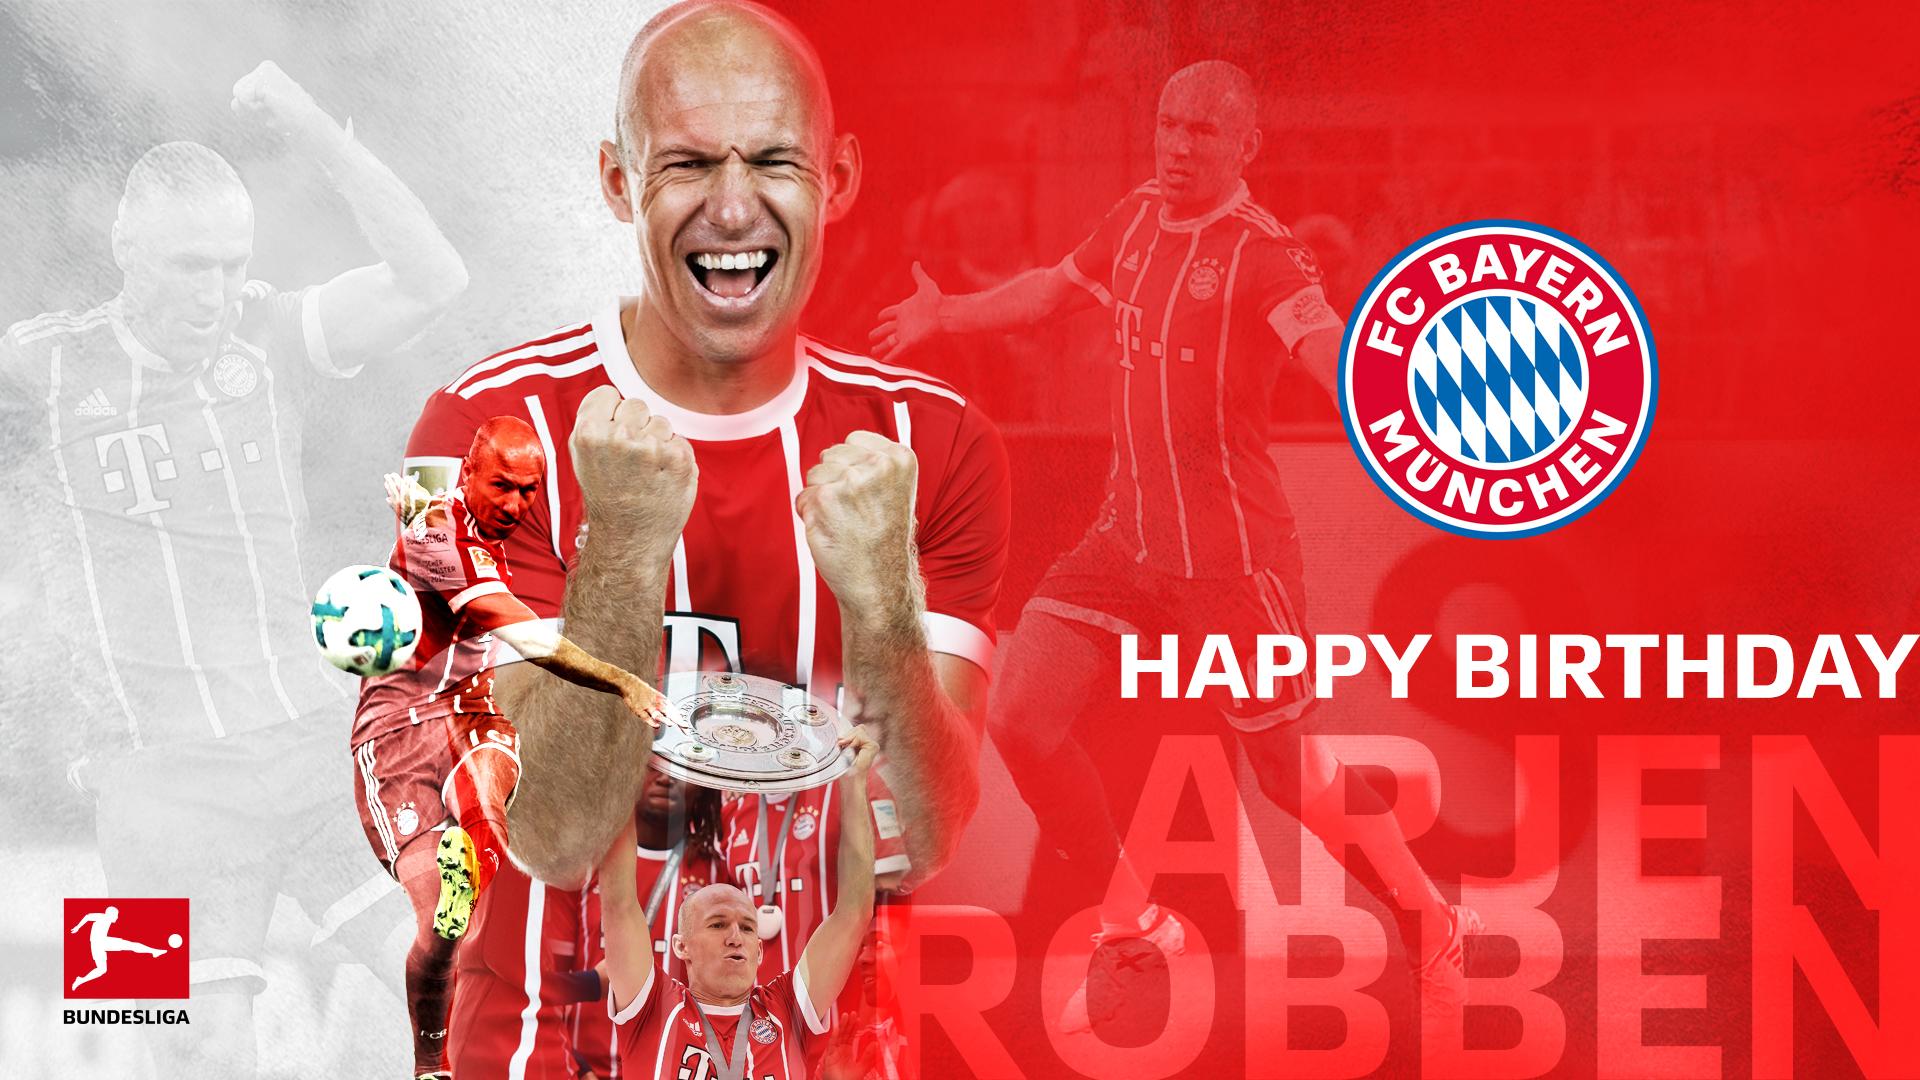 Arjen Robben Birthday 1920x1080